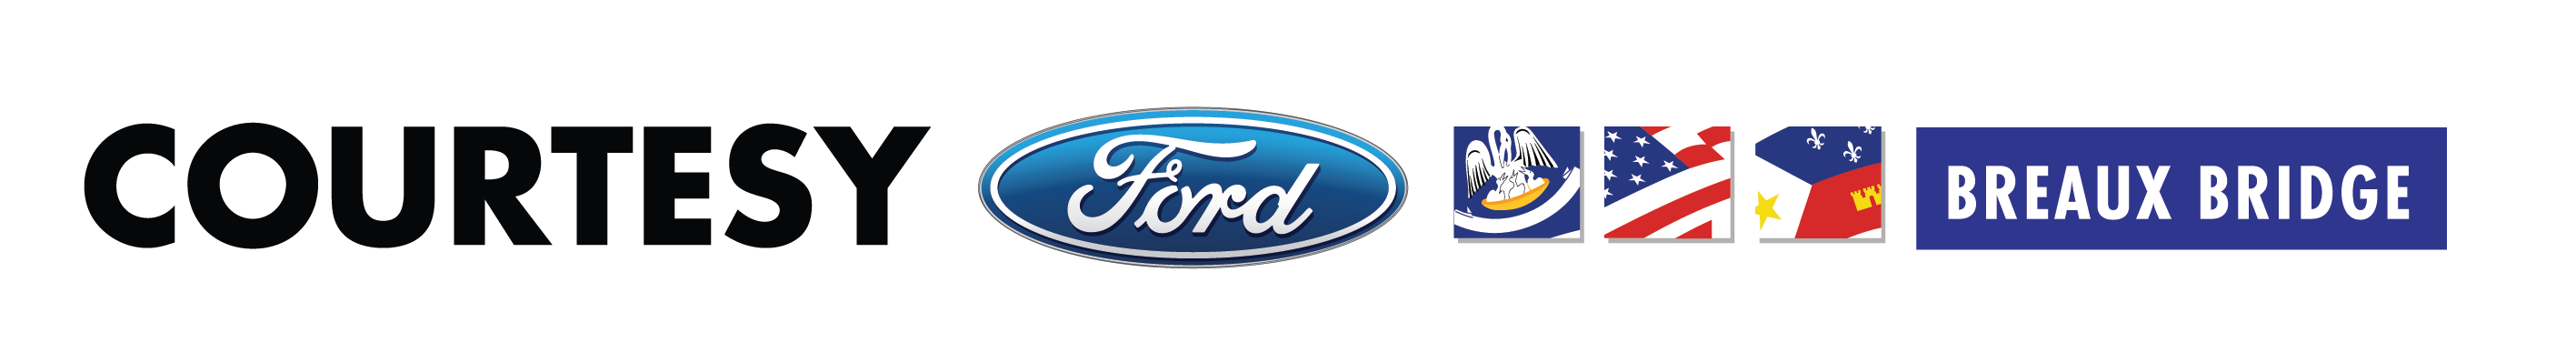 Courtesy Ford